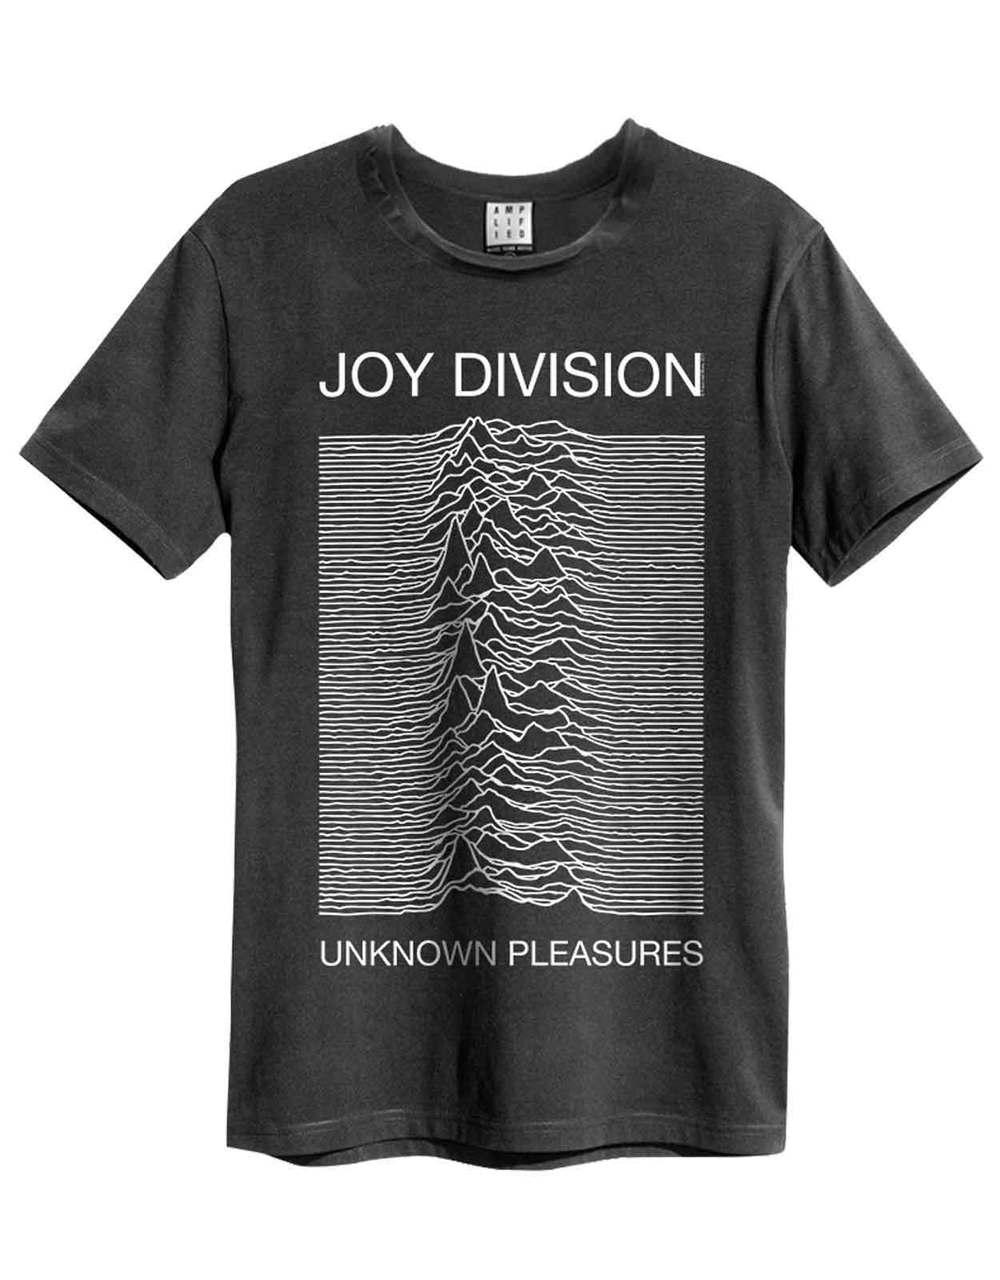 Joy Division Tee